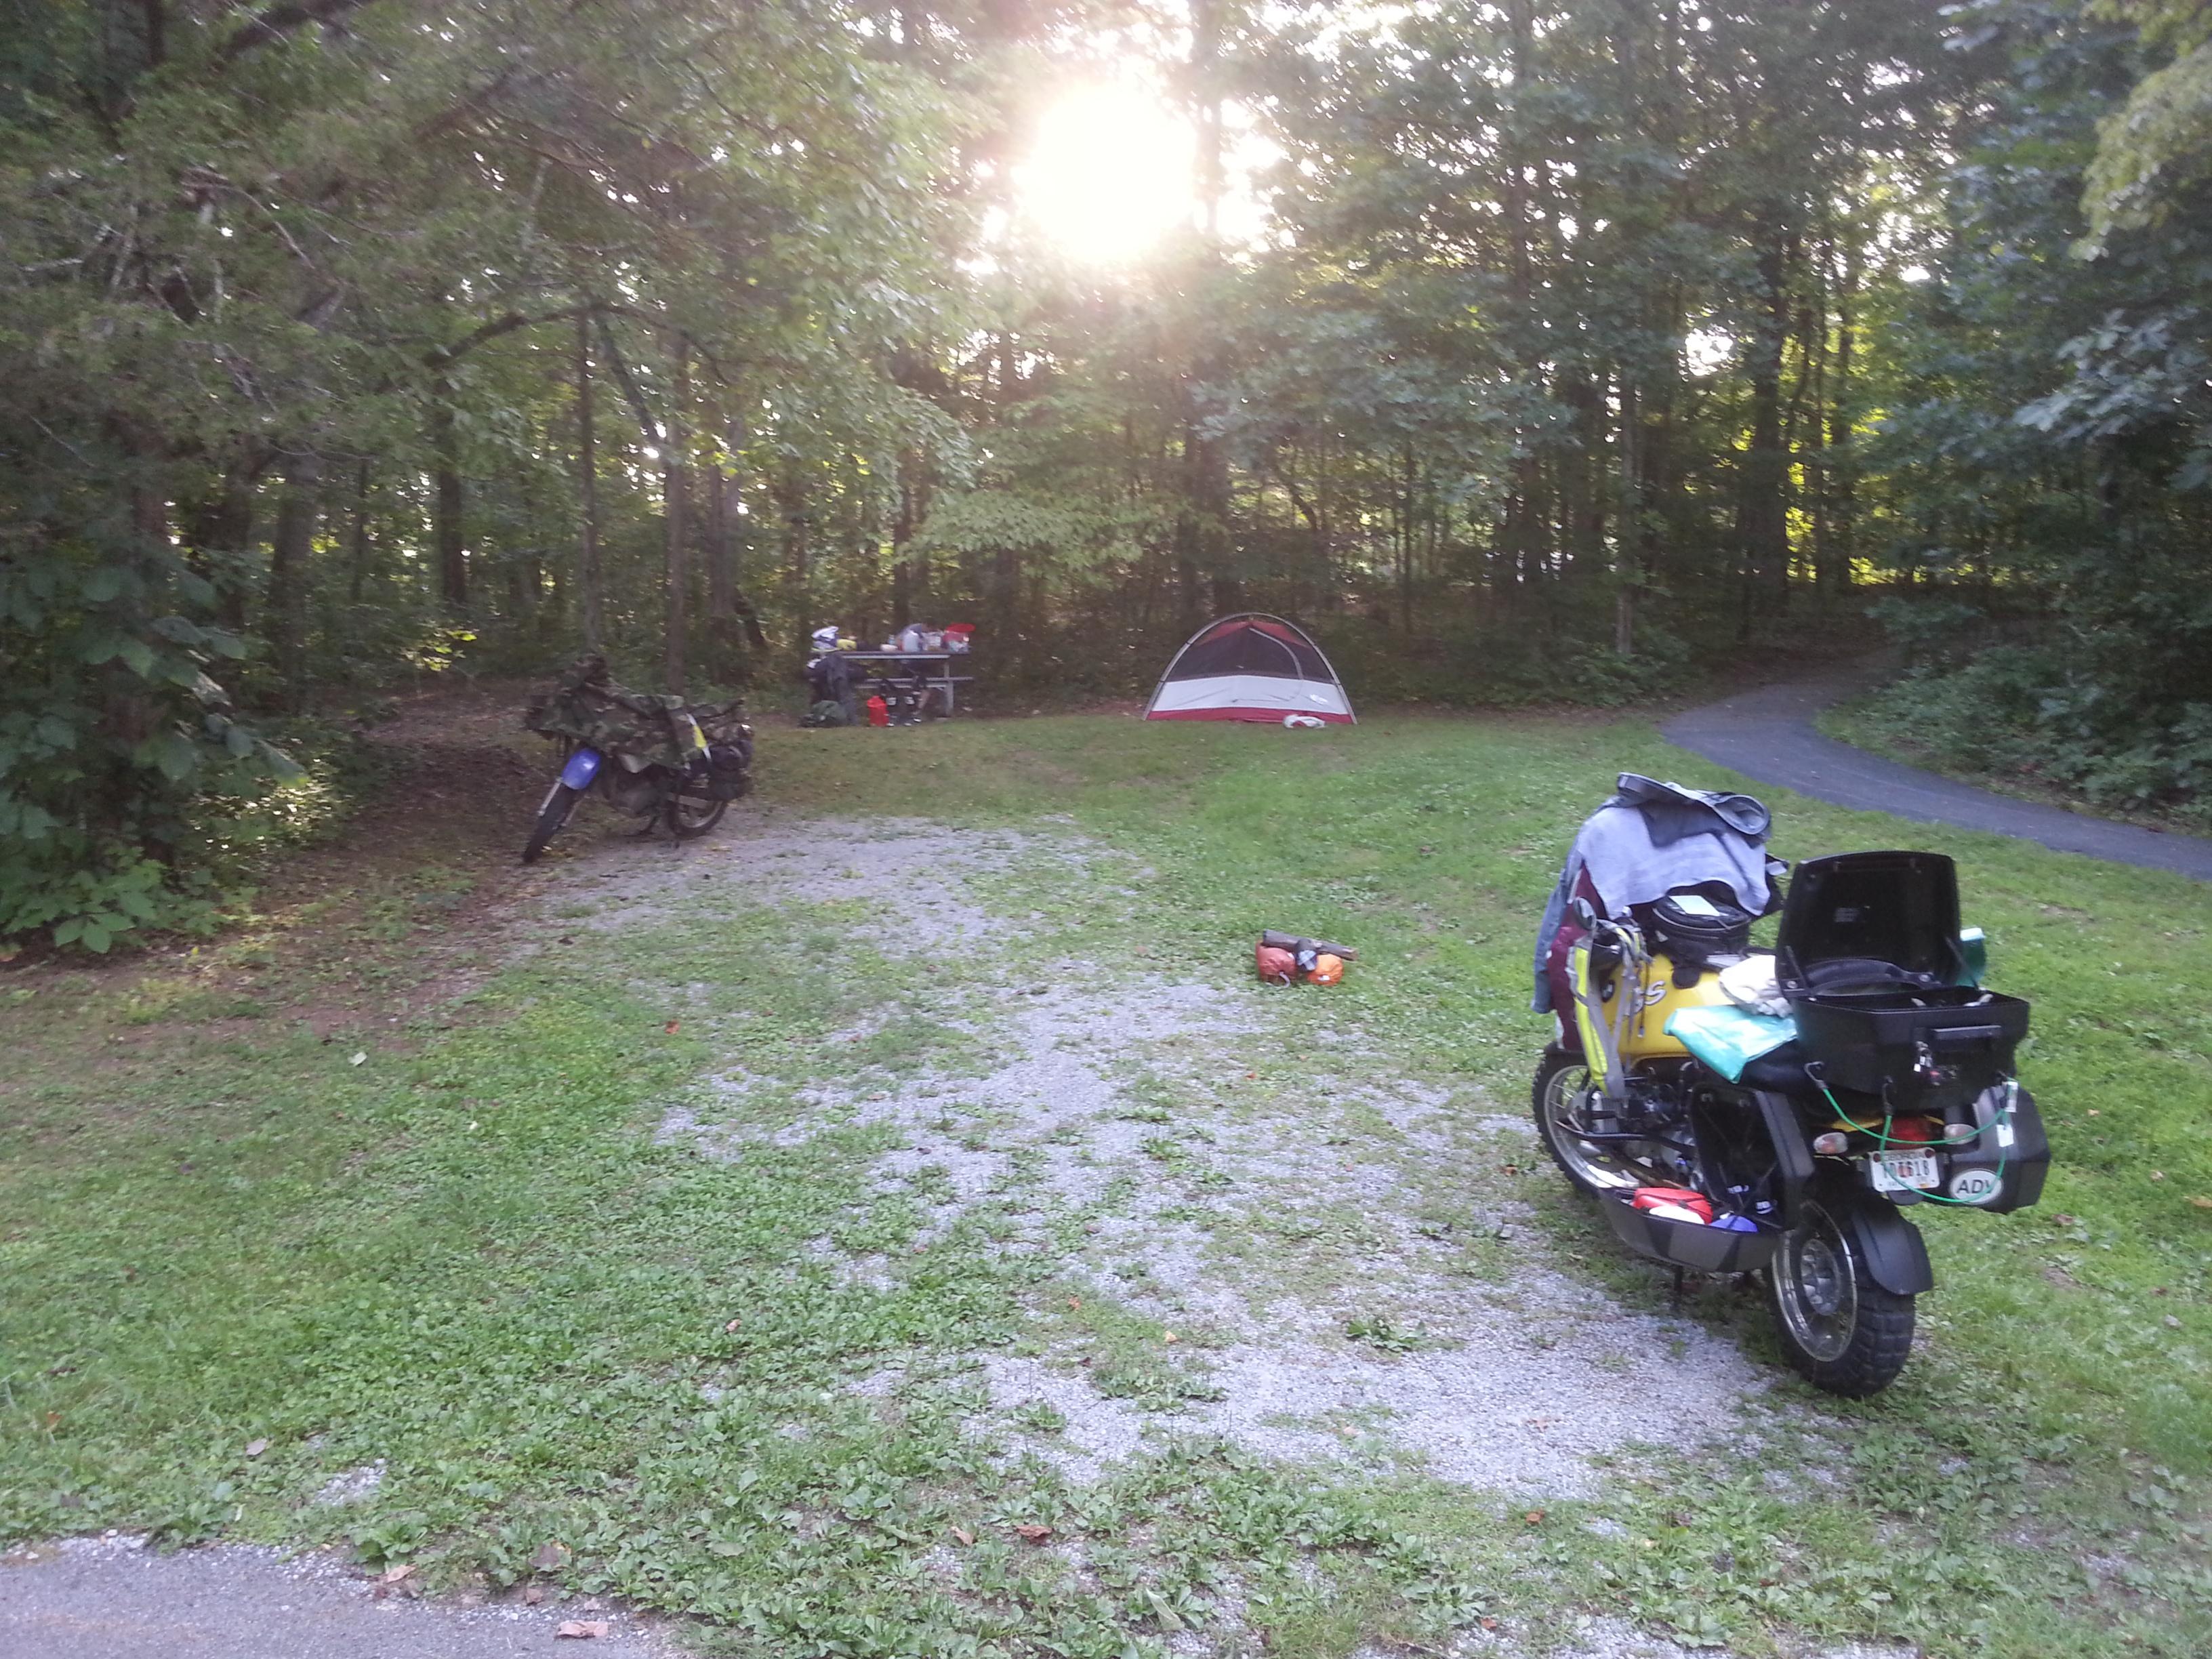 Cumberland Gap National Historic Park campground